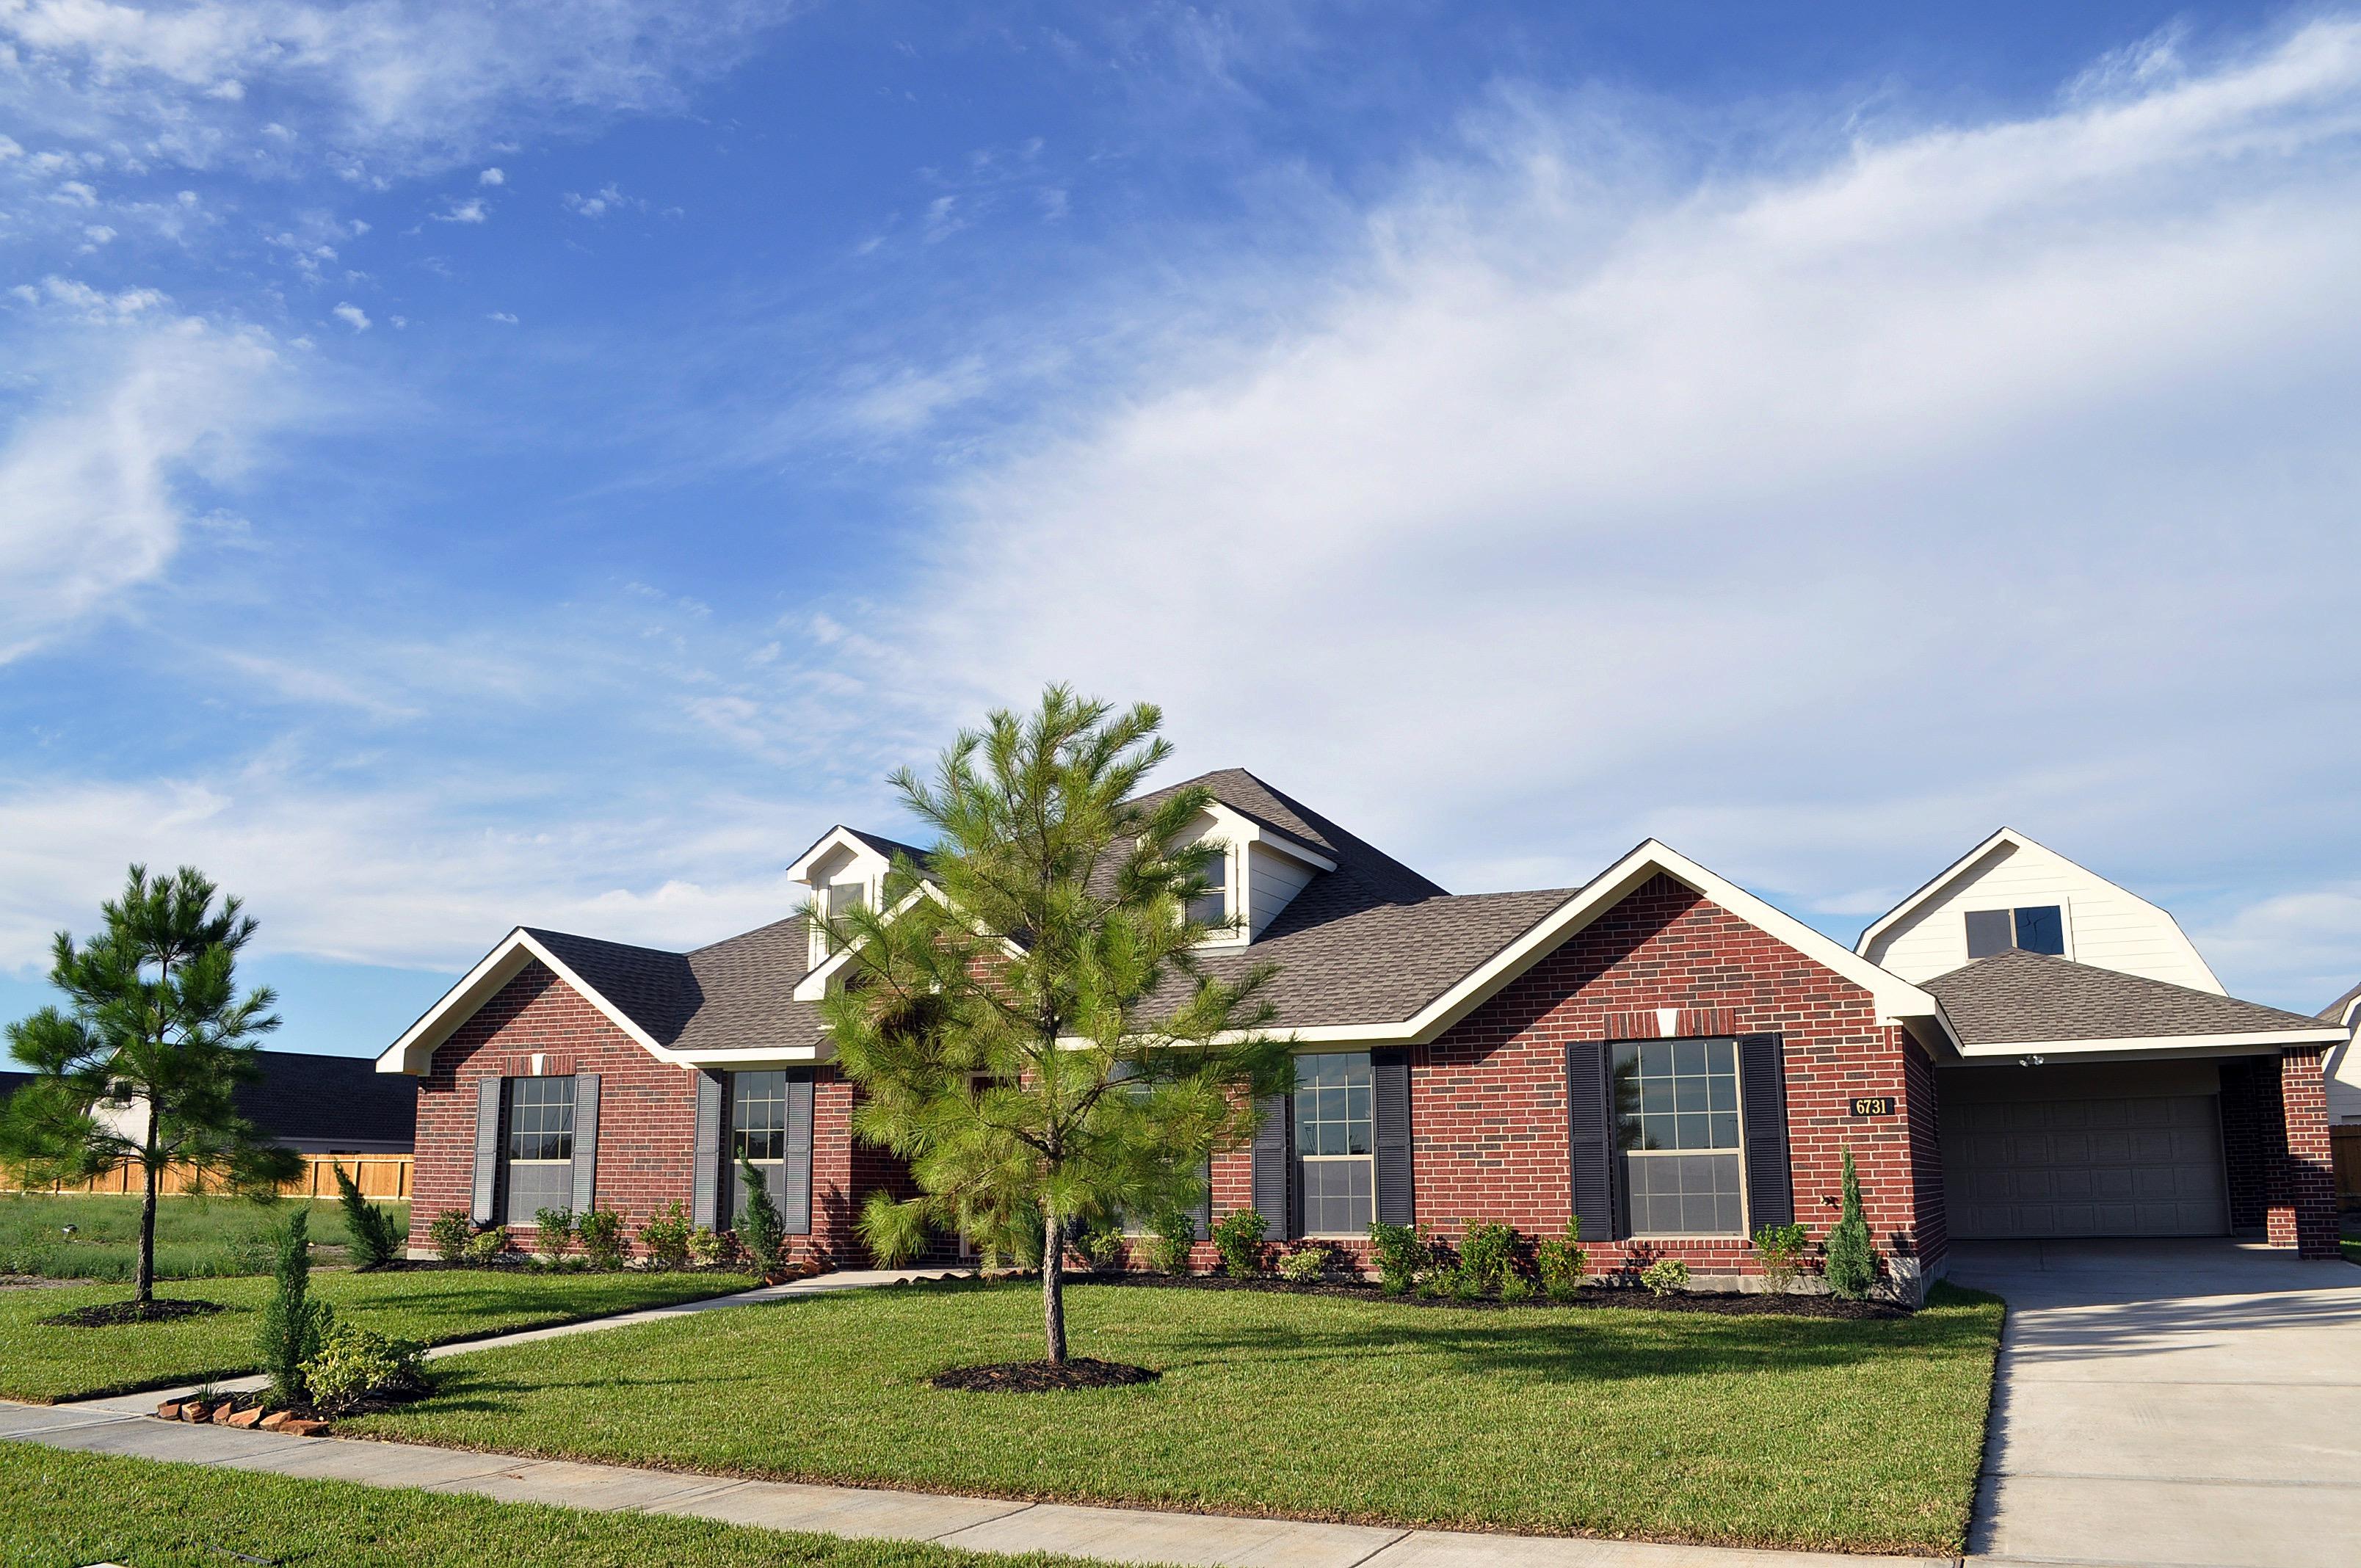 Build A Car >> Cervelle Homes Plan 407 Gallery